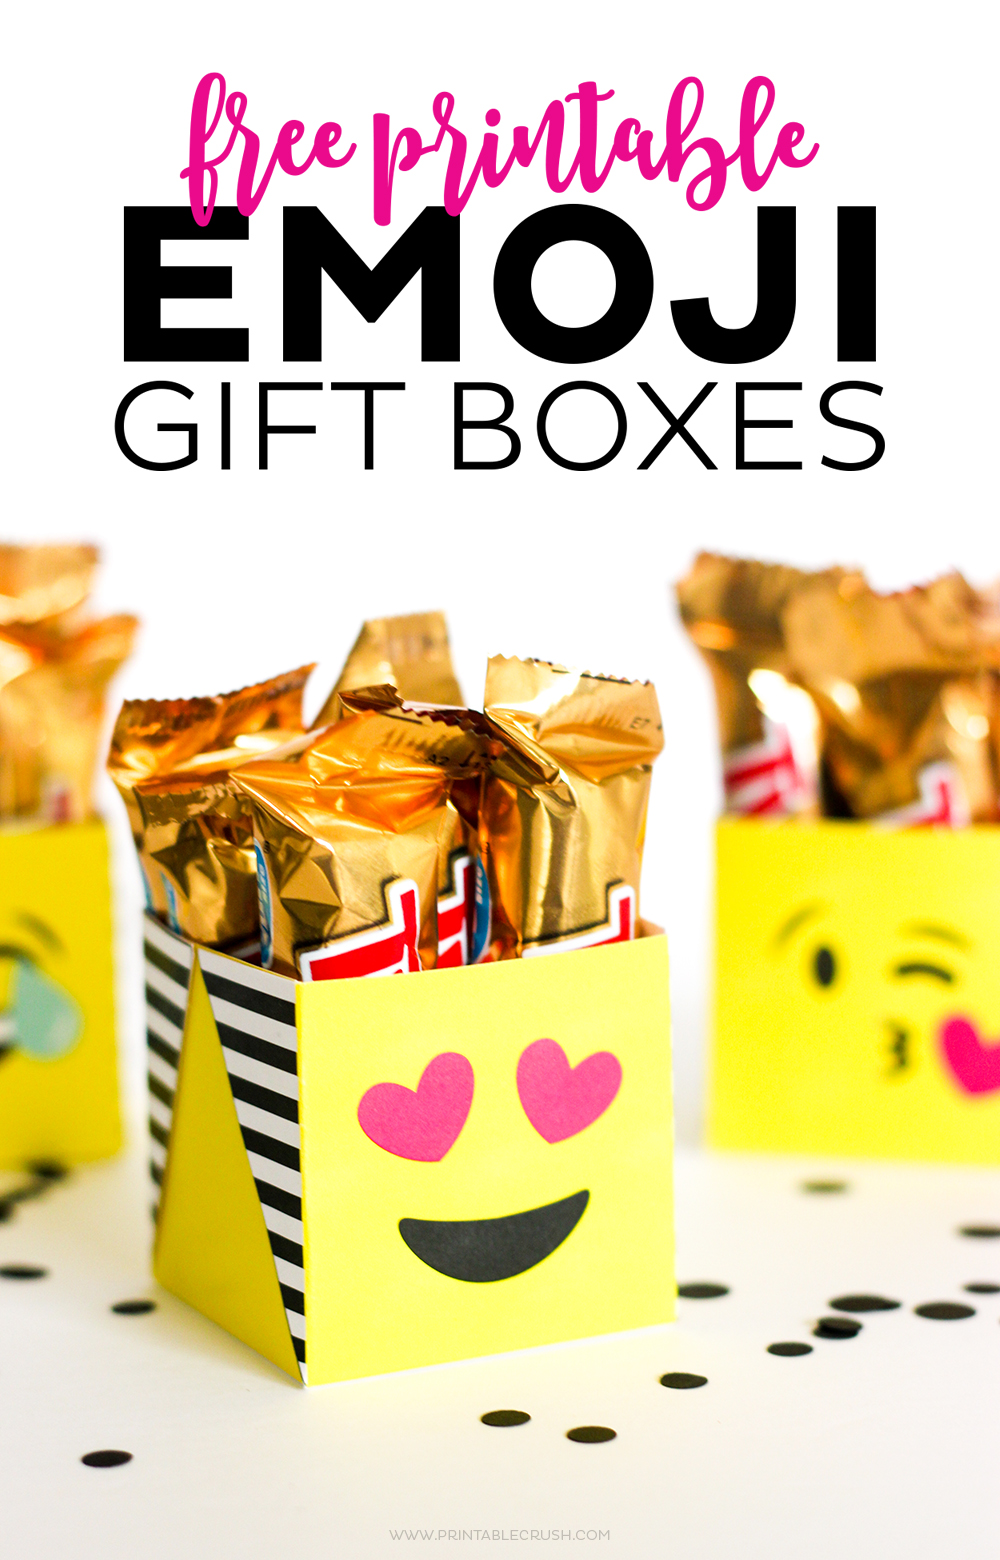 picture about Free Printable Emojis identify Emoji Items - Offer Them Having My Cost-free Printable Emoji